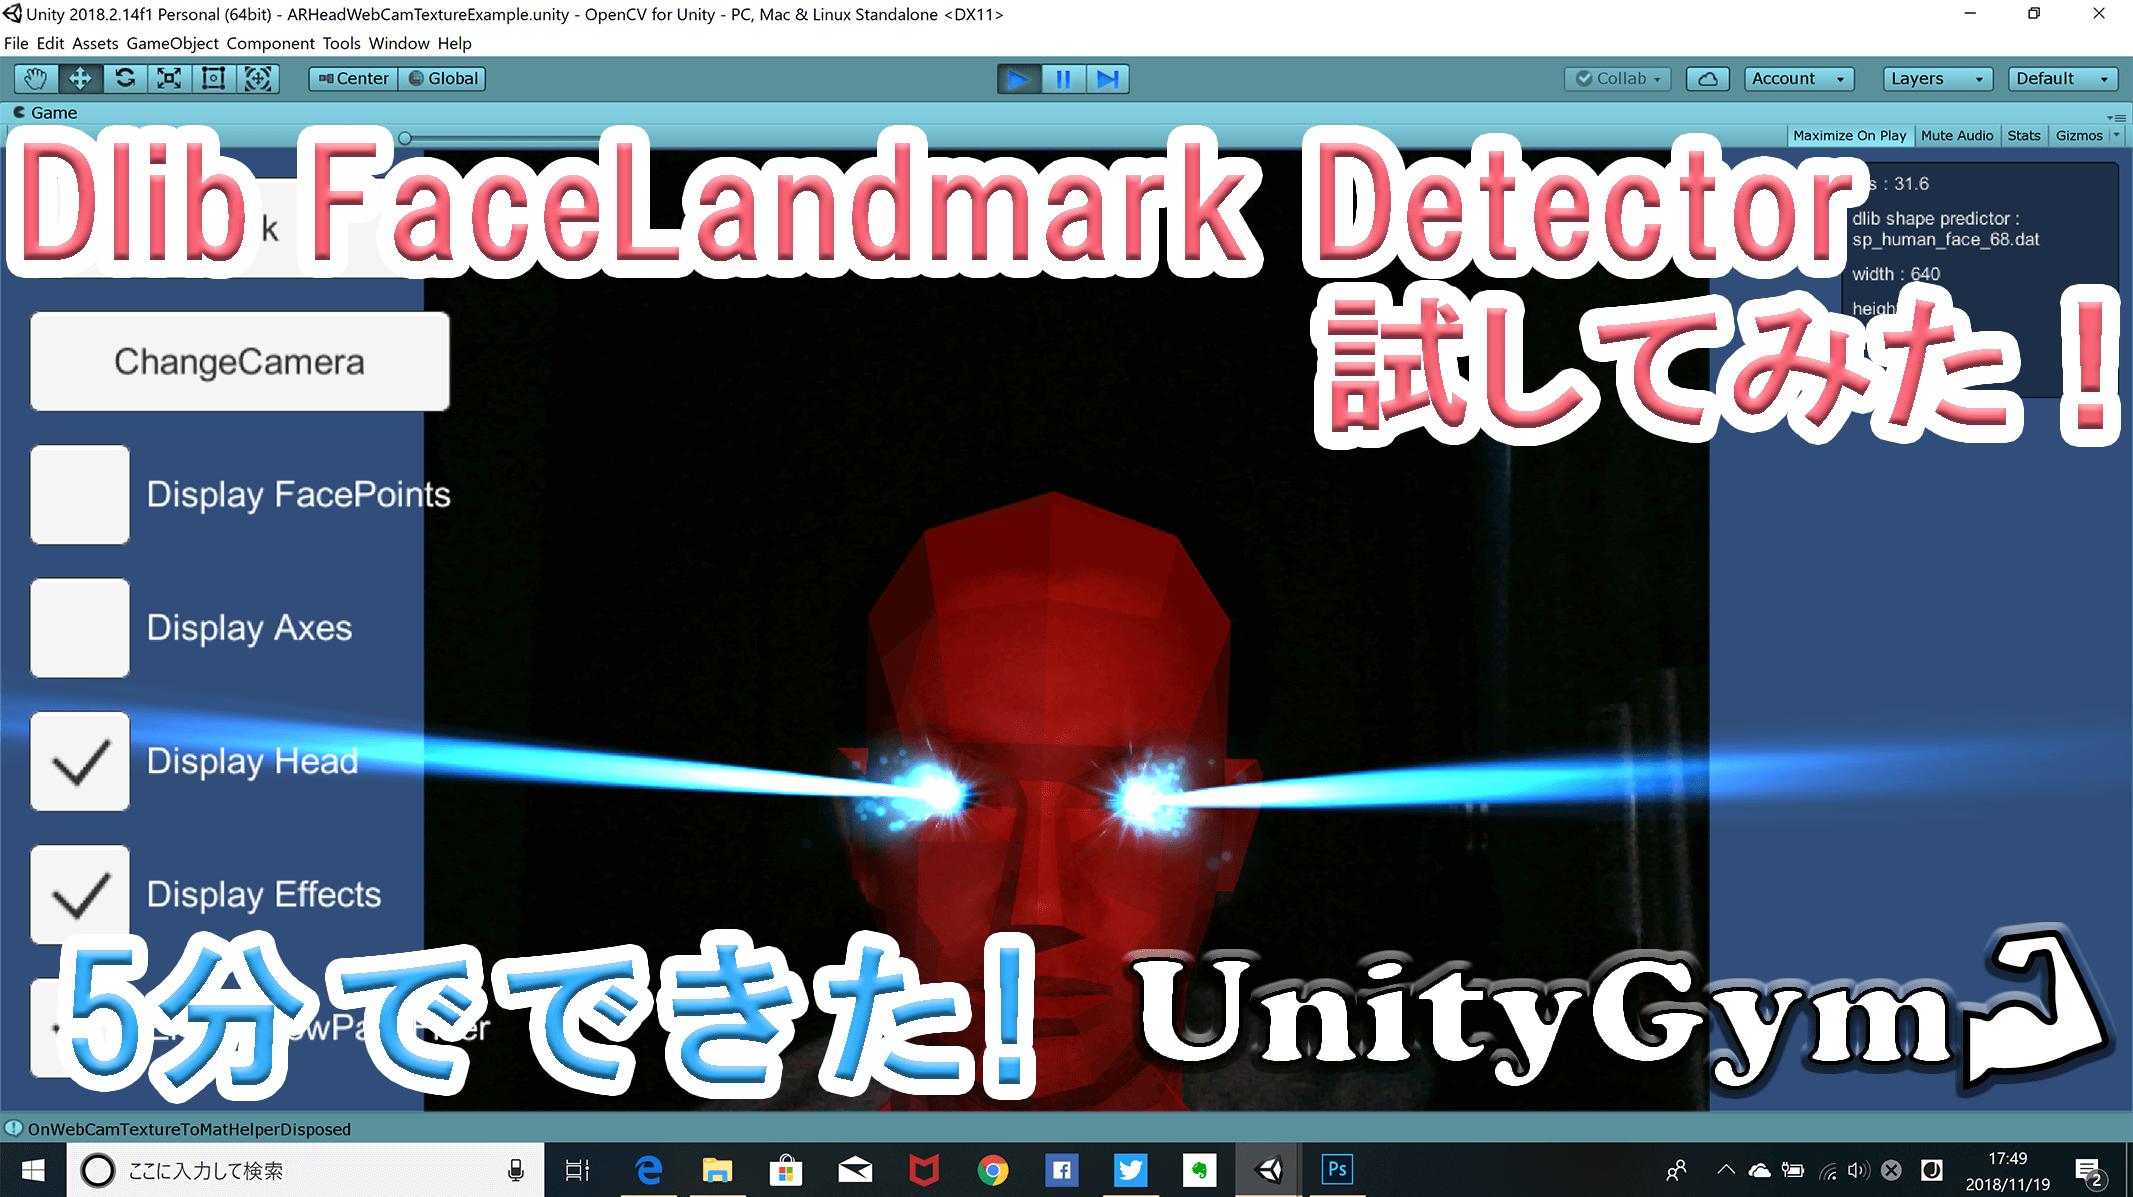 Unity】Dlib FaceLandmark Detector試してみた! | 実践